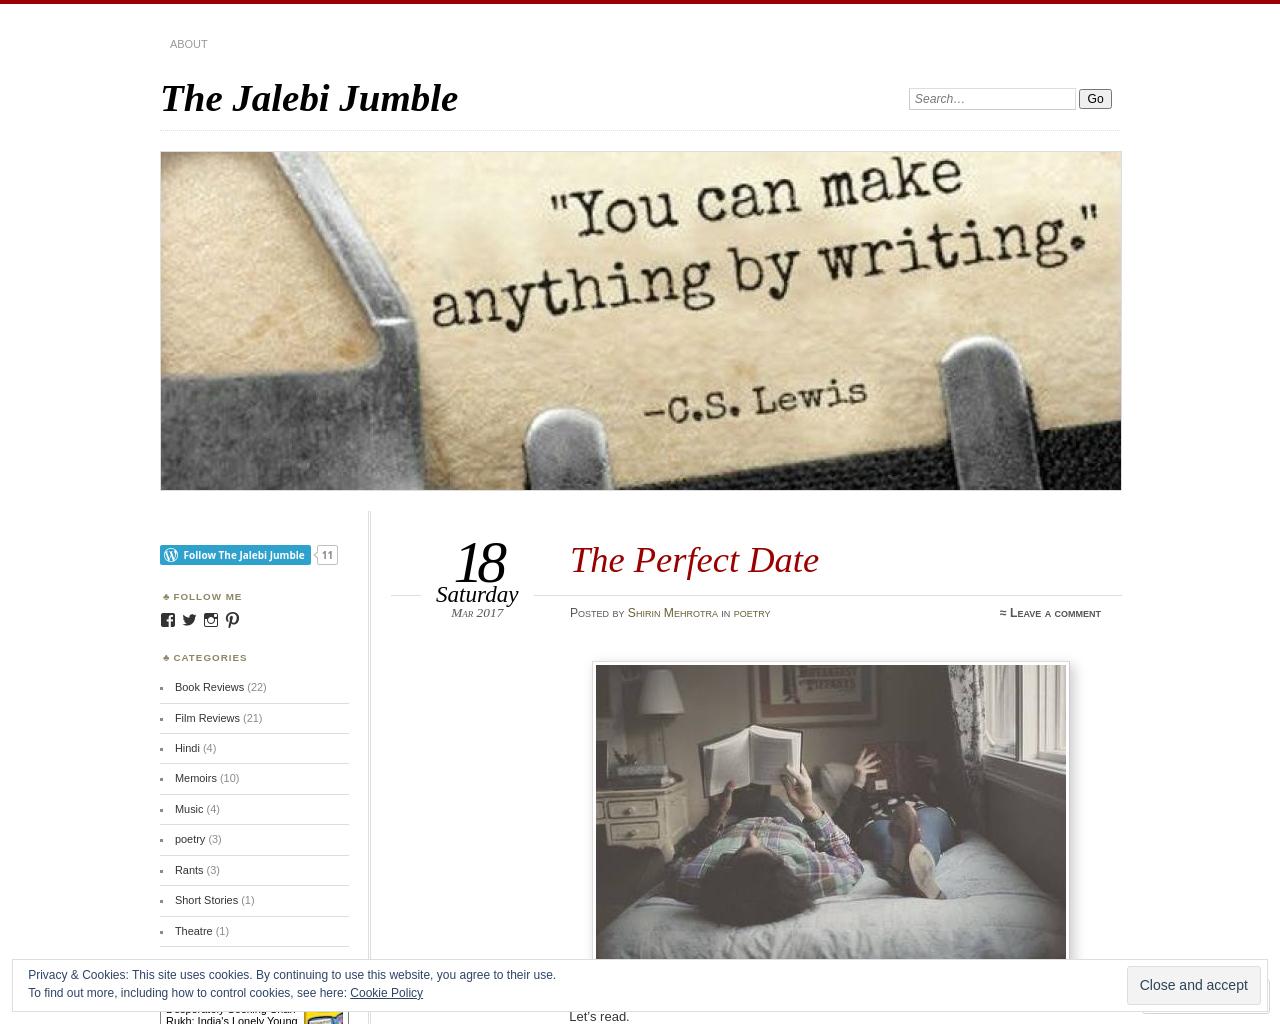 The Jalebi Jumble